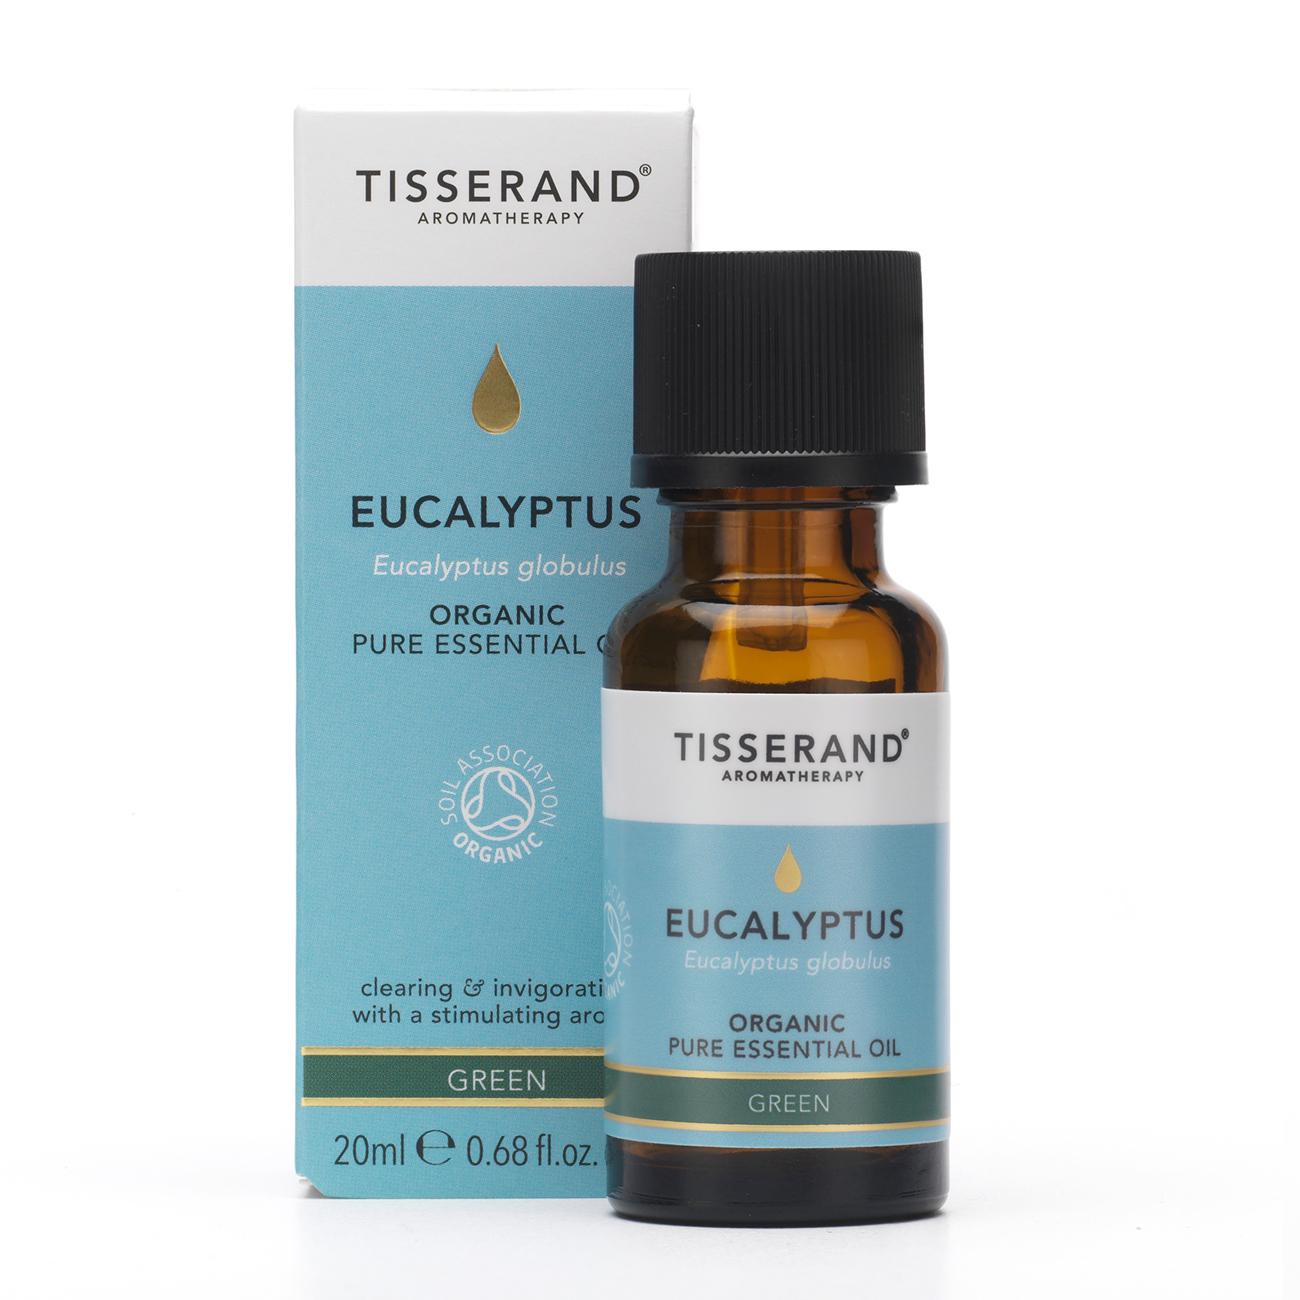 Eucalyptus Organic Pure Essential Oil 20ml